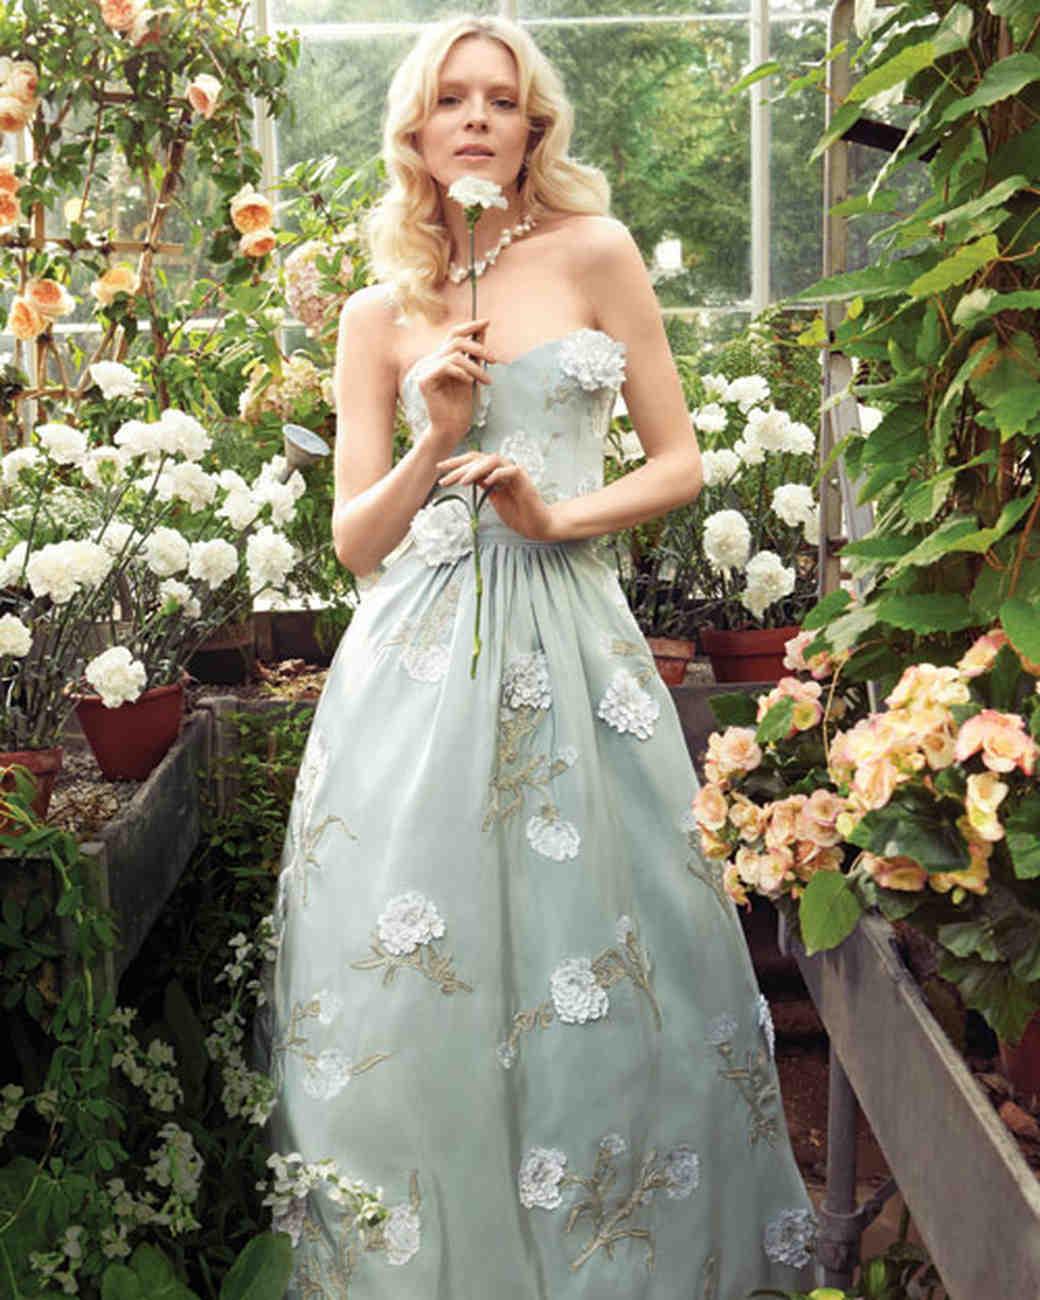 Blue Wedding Dress With Flowers